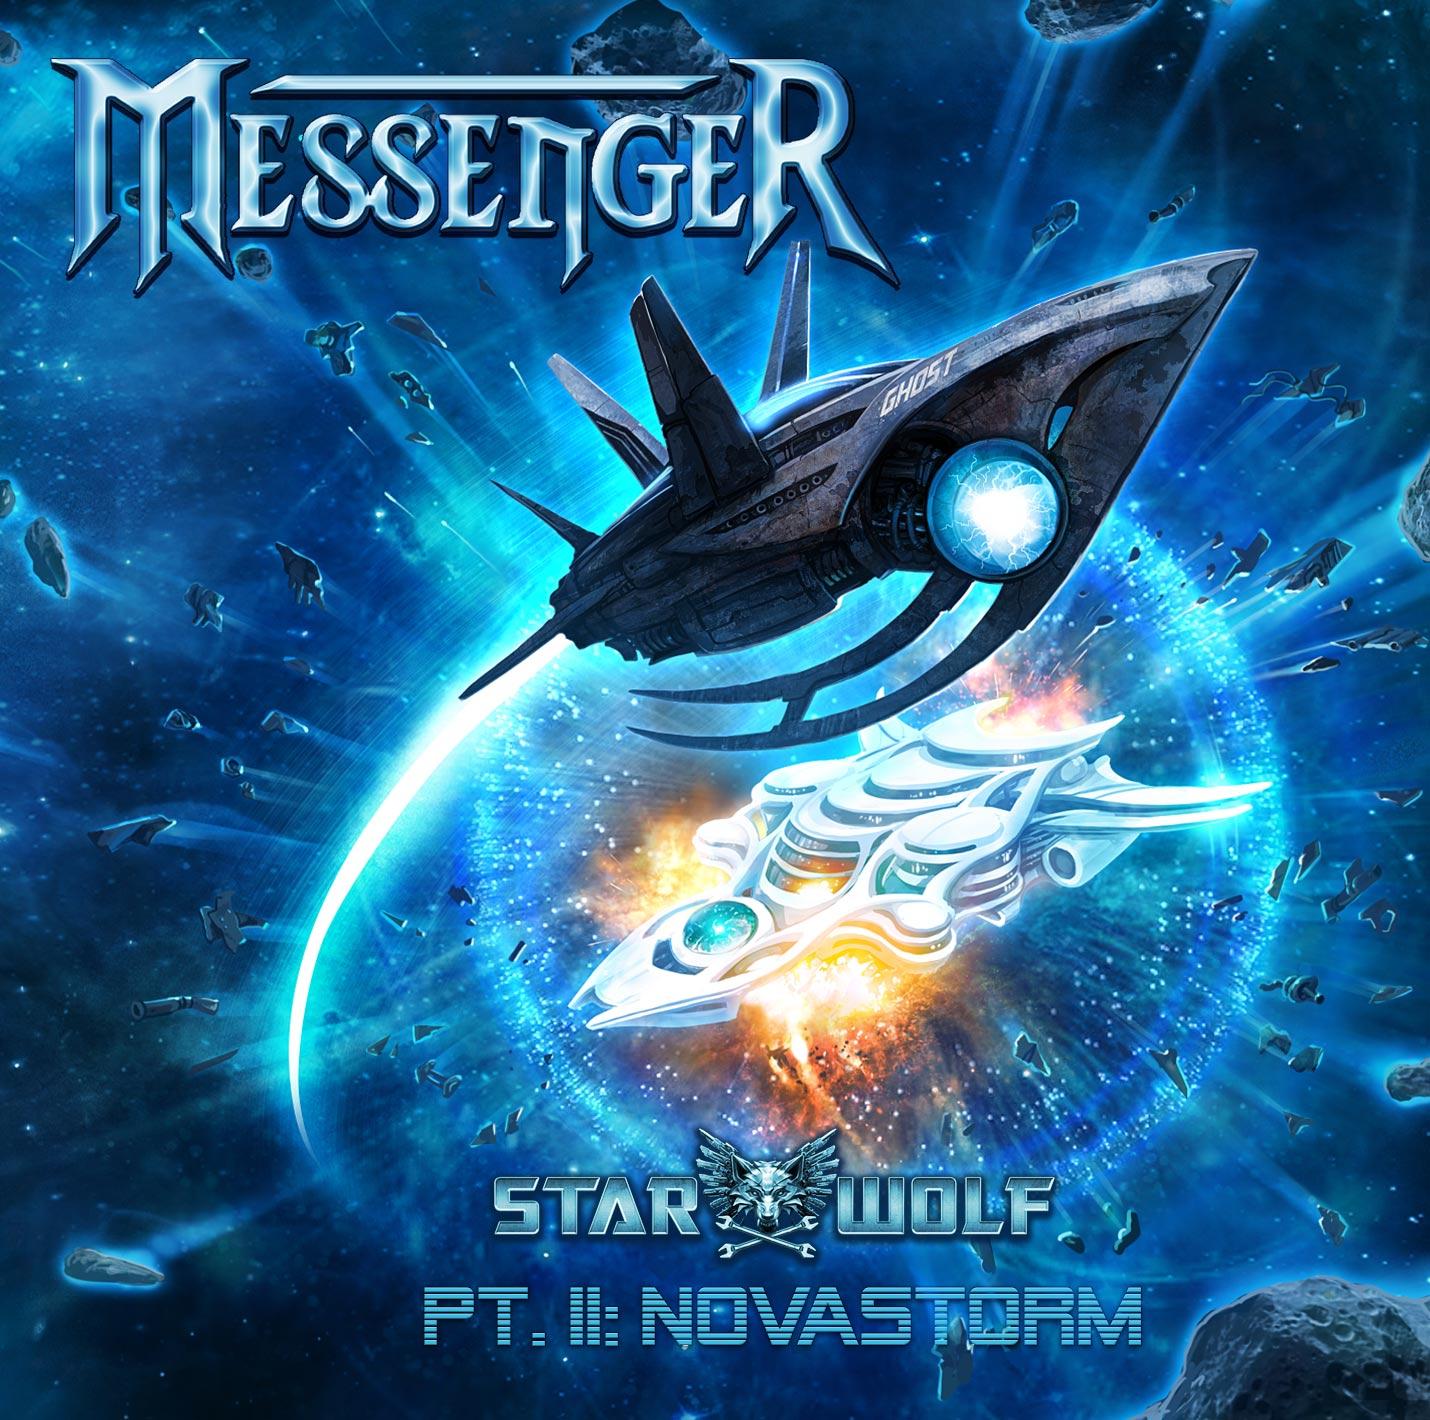 Messenger STARWOLF - PT. II- NOVASTROM